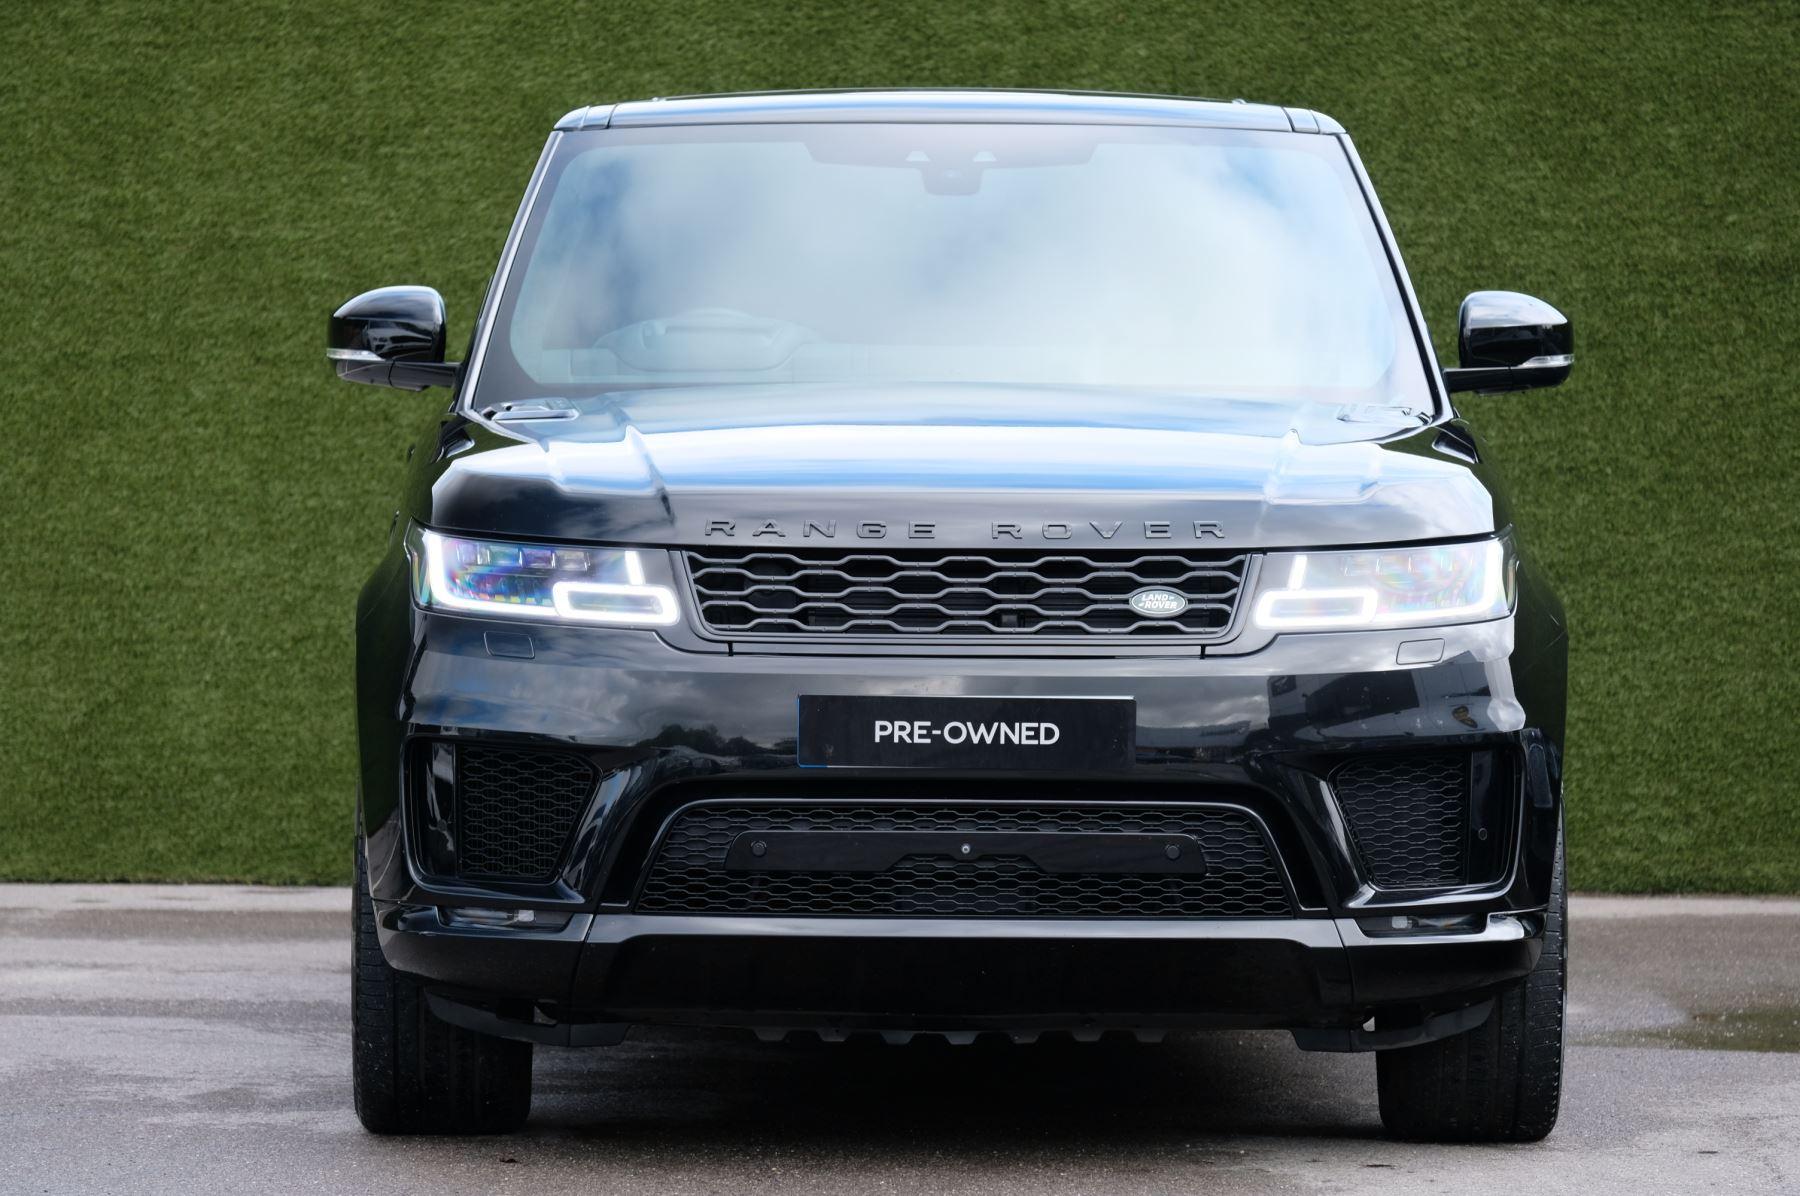 Land Rover Range Rover Sport 3.0 SDV6 Autobiography Dynamic 5dr image 3